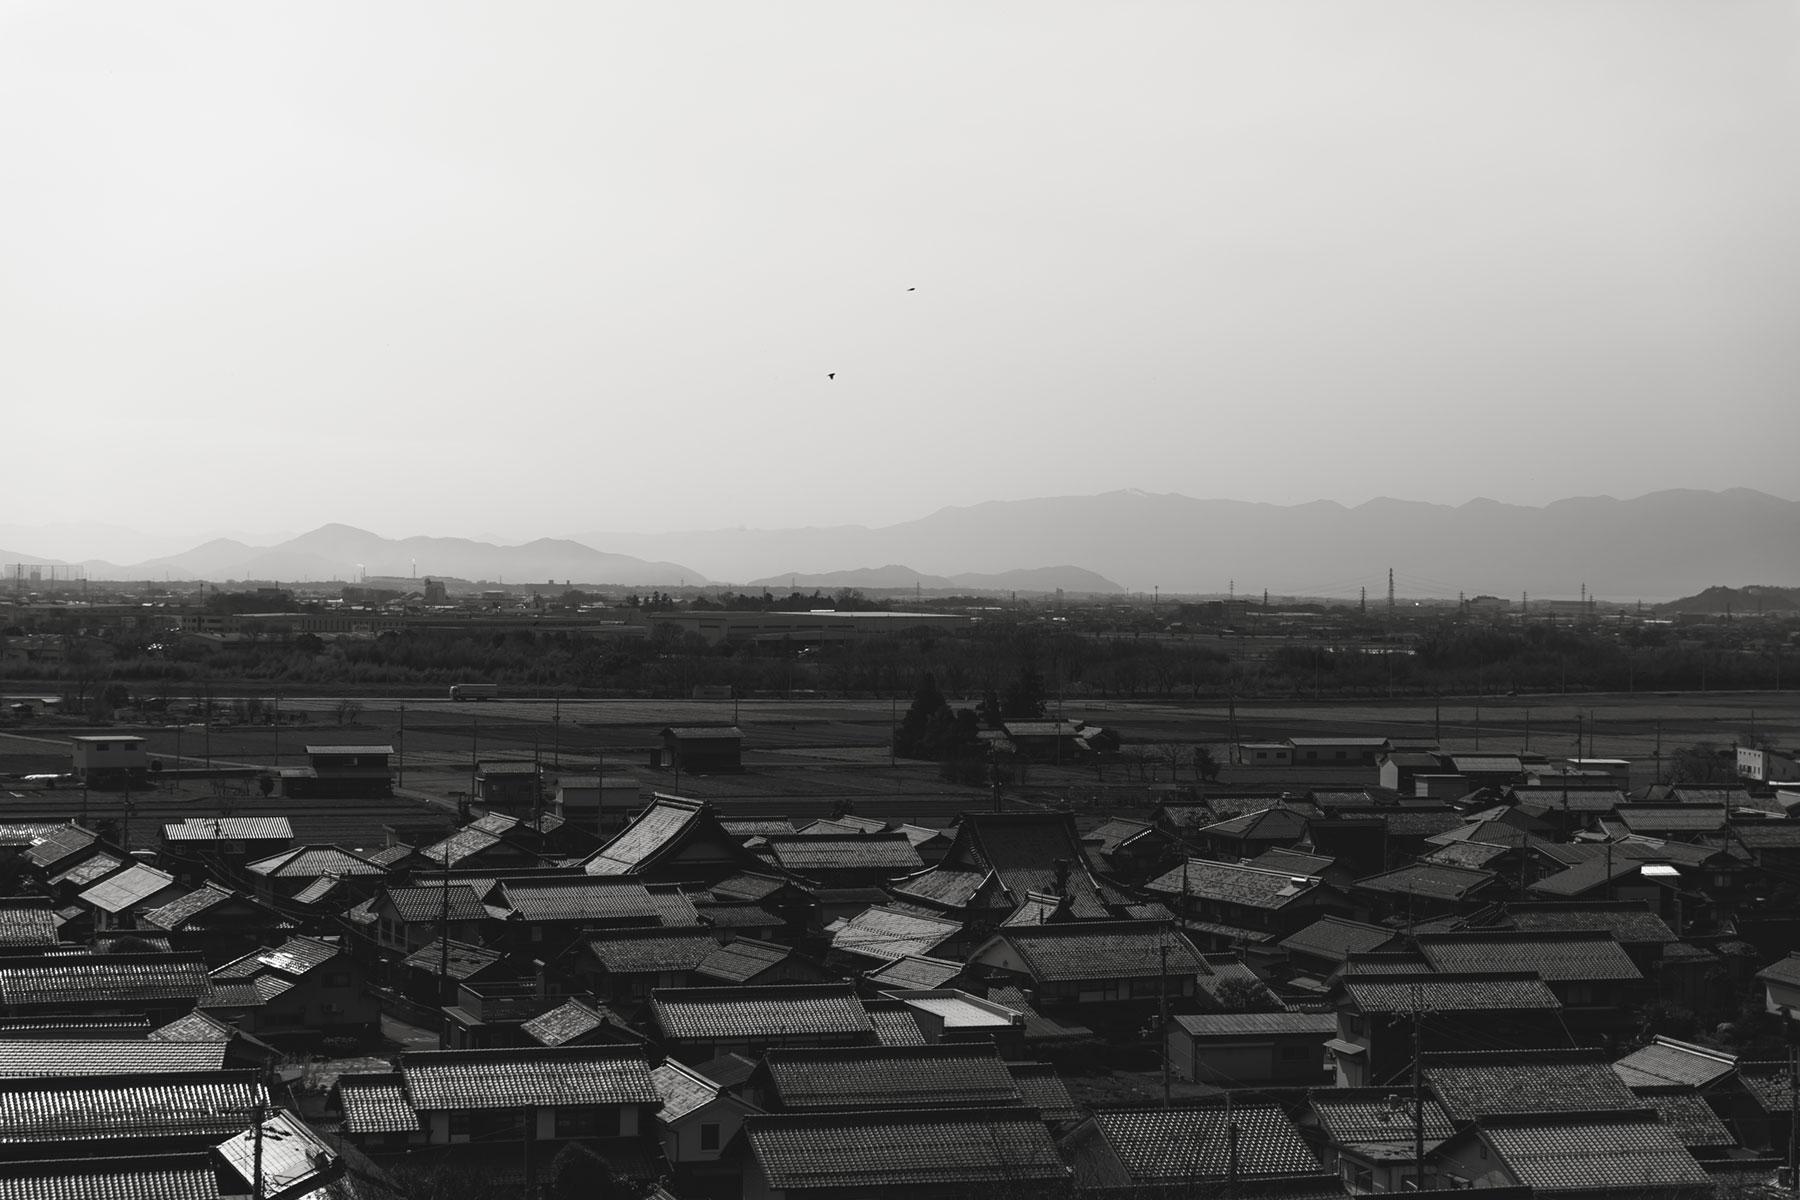 Shiga Biwako